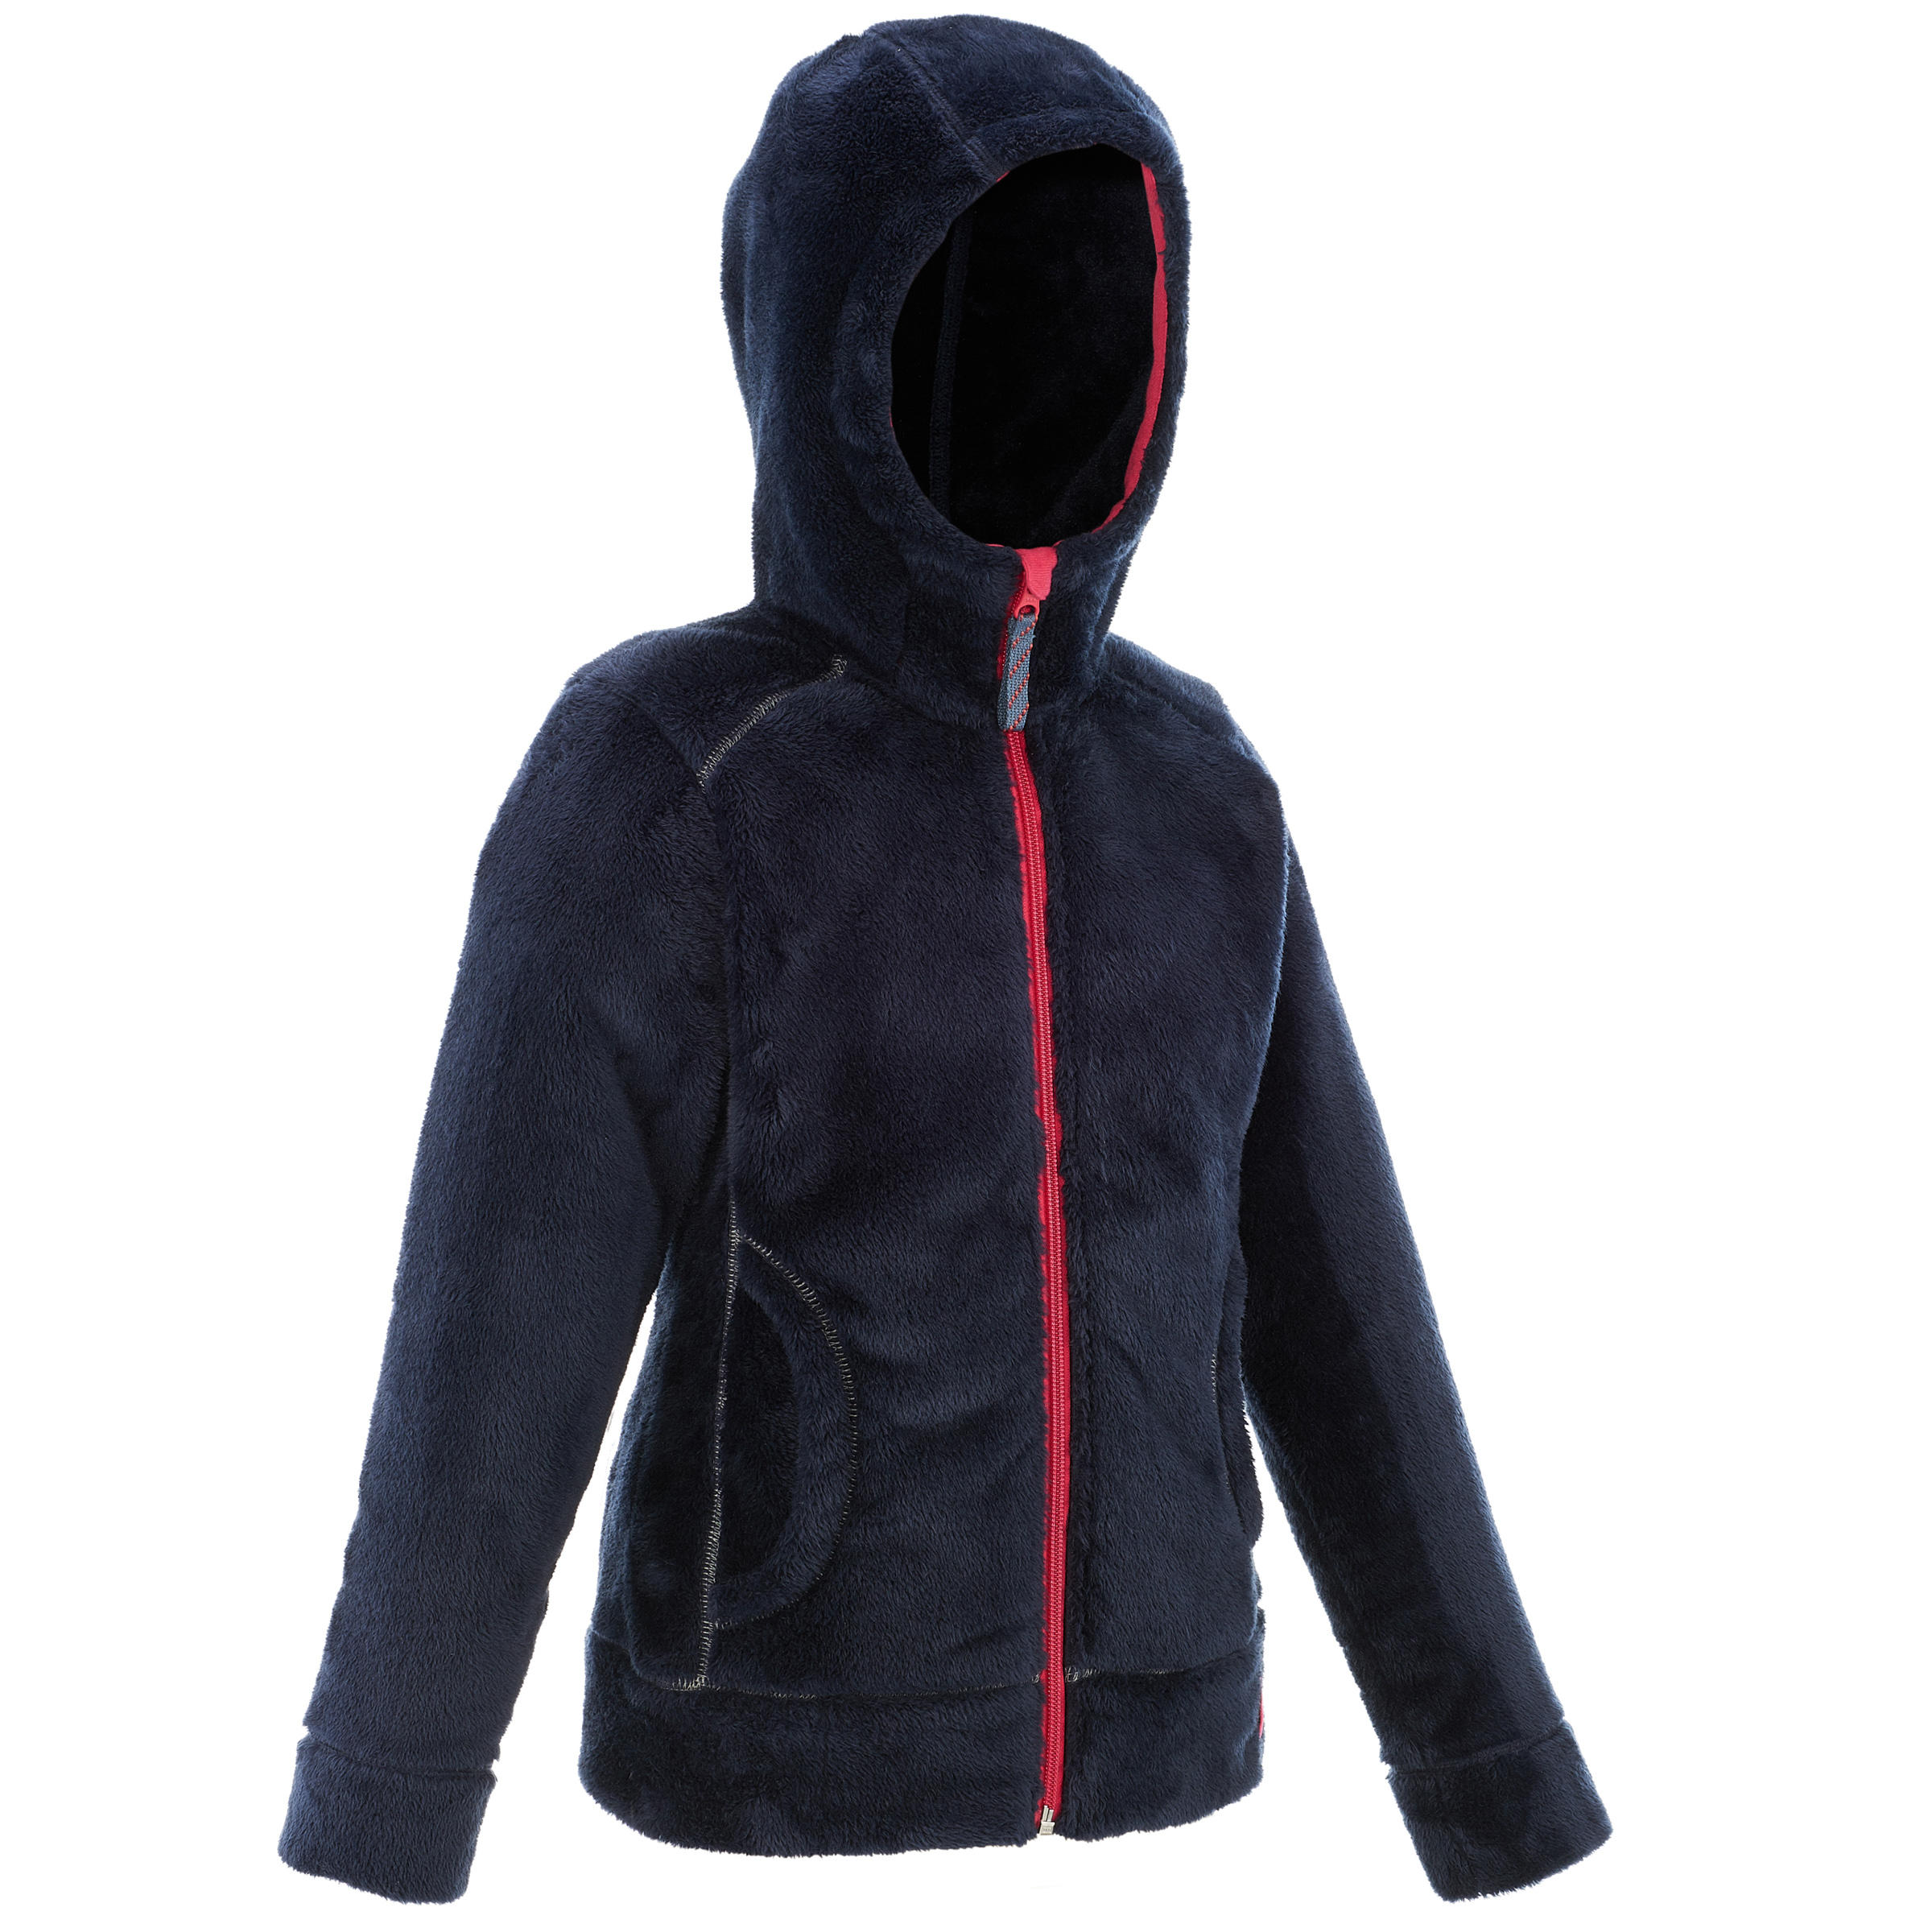 SH100 Warm Child's Snow Hiking Fleece Jacket -Blue